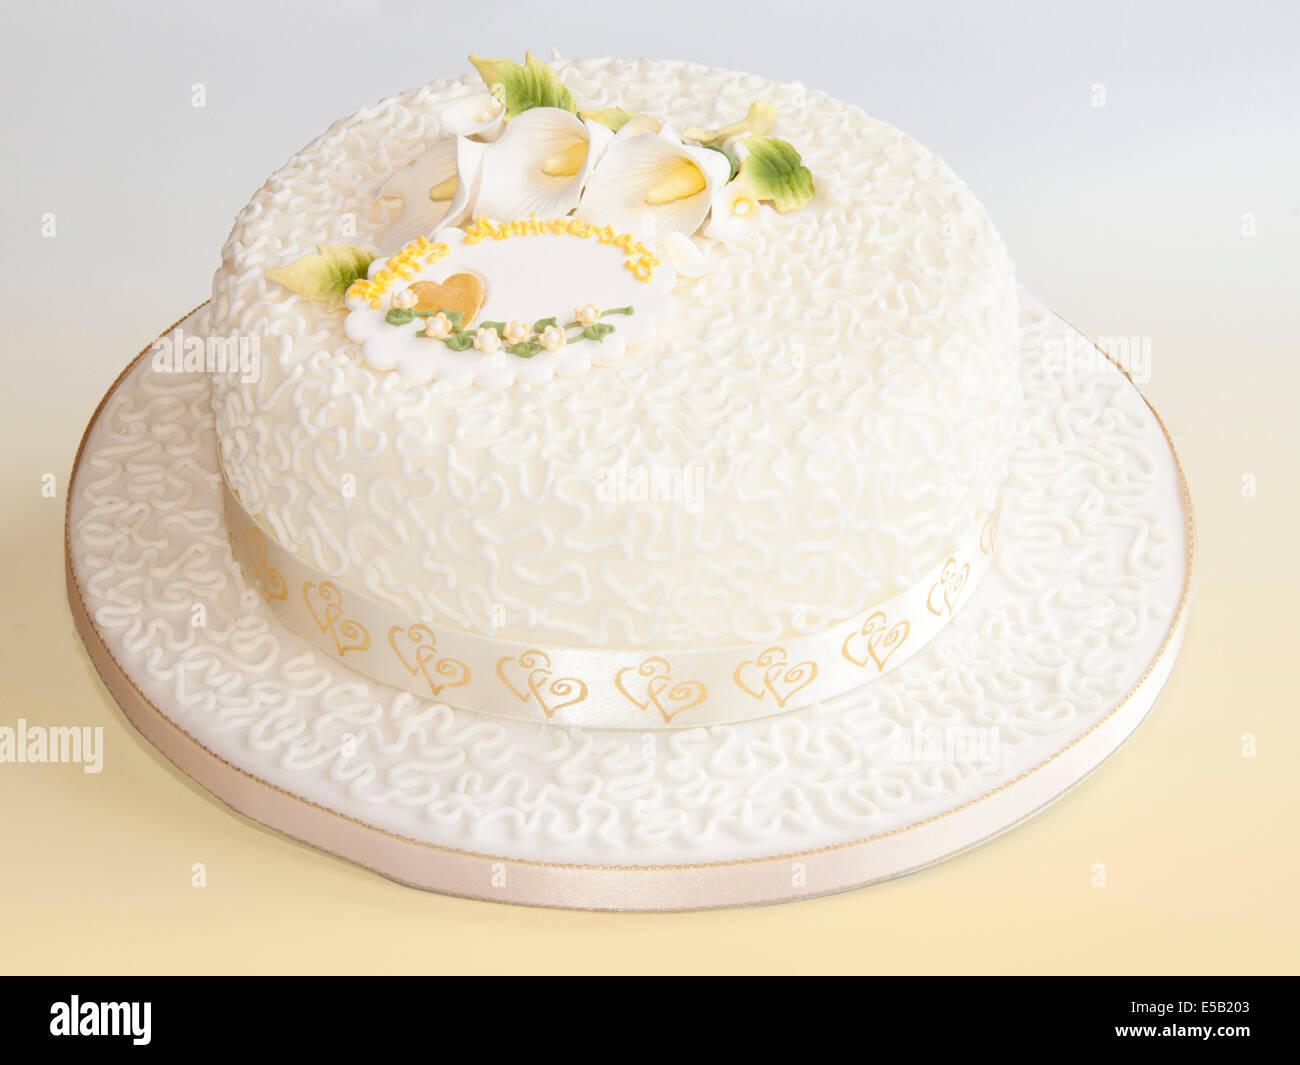 Golden Wedding Anniversary Cake Stock Photos & Golden Wedding ...